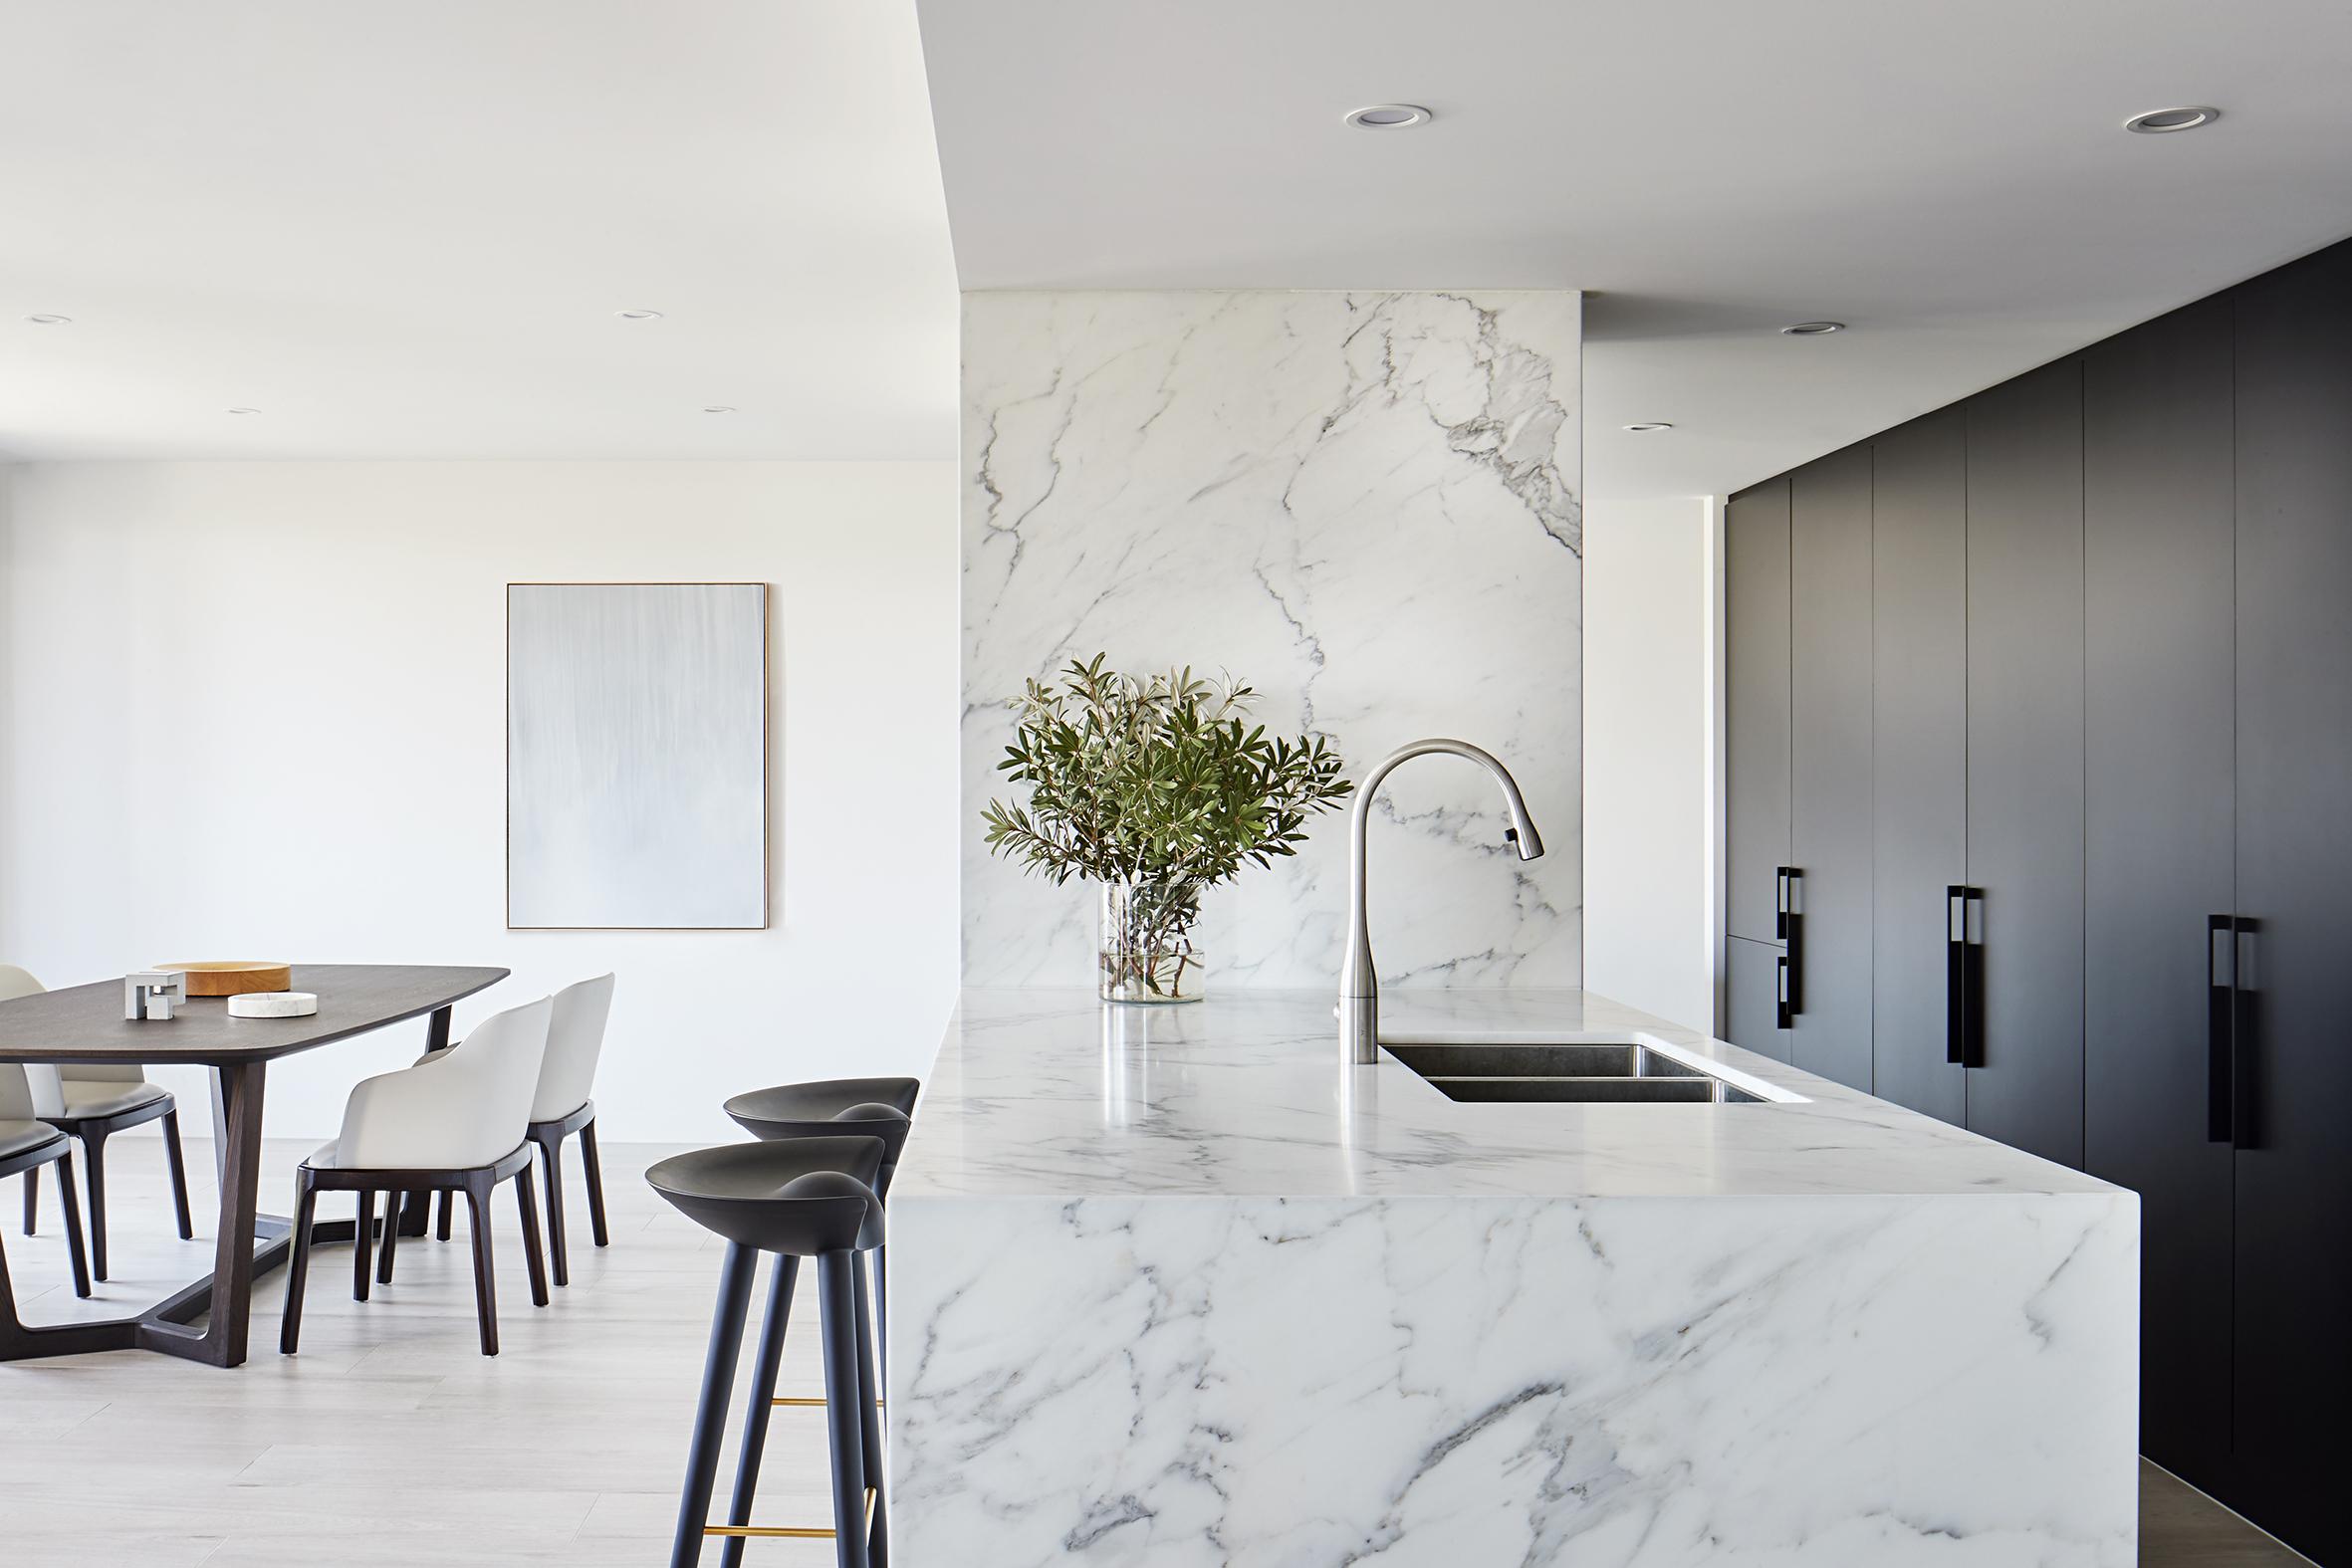 Gallery Of Compartment Apartment Local Australian Architecture & Design Richmond, Melbourne Image 5